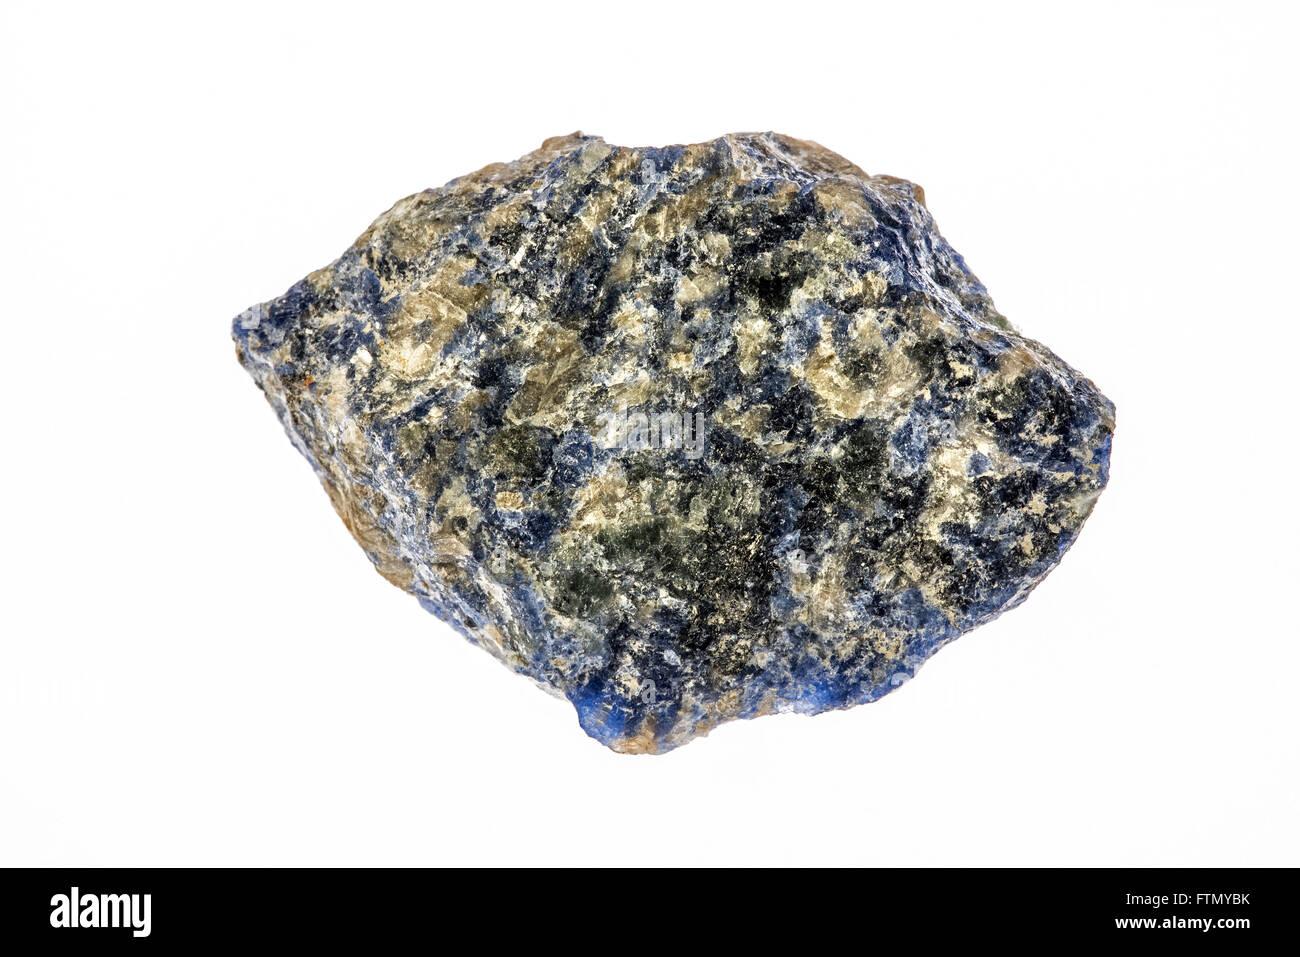 Sodalite, royal blue tectosilicate mineral specimen, on white background - Stock Image